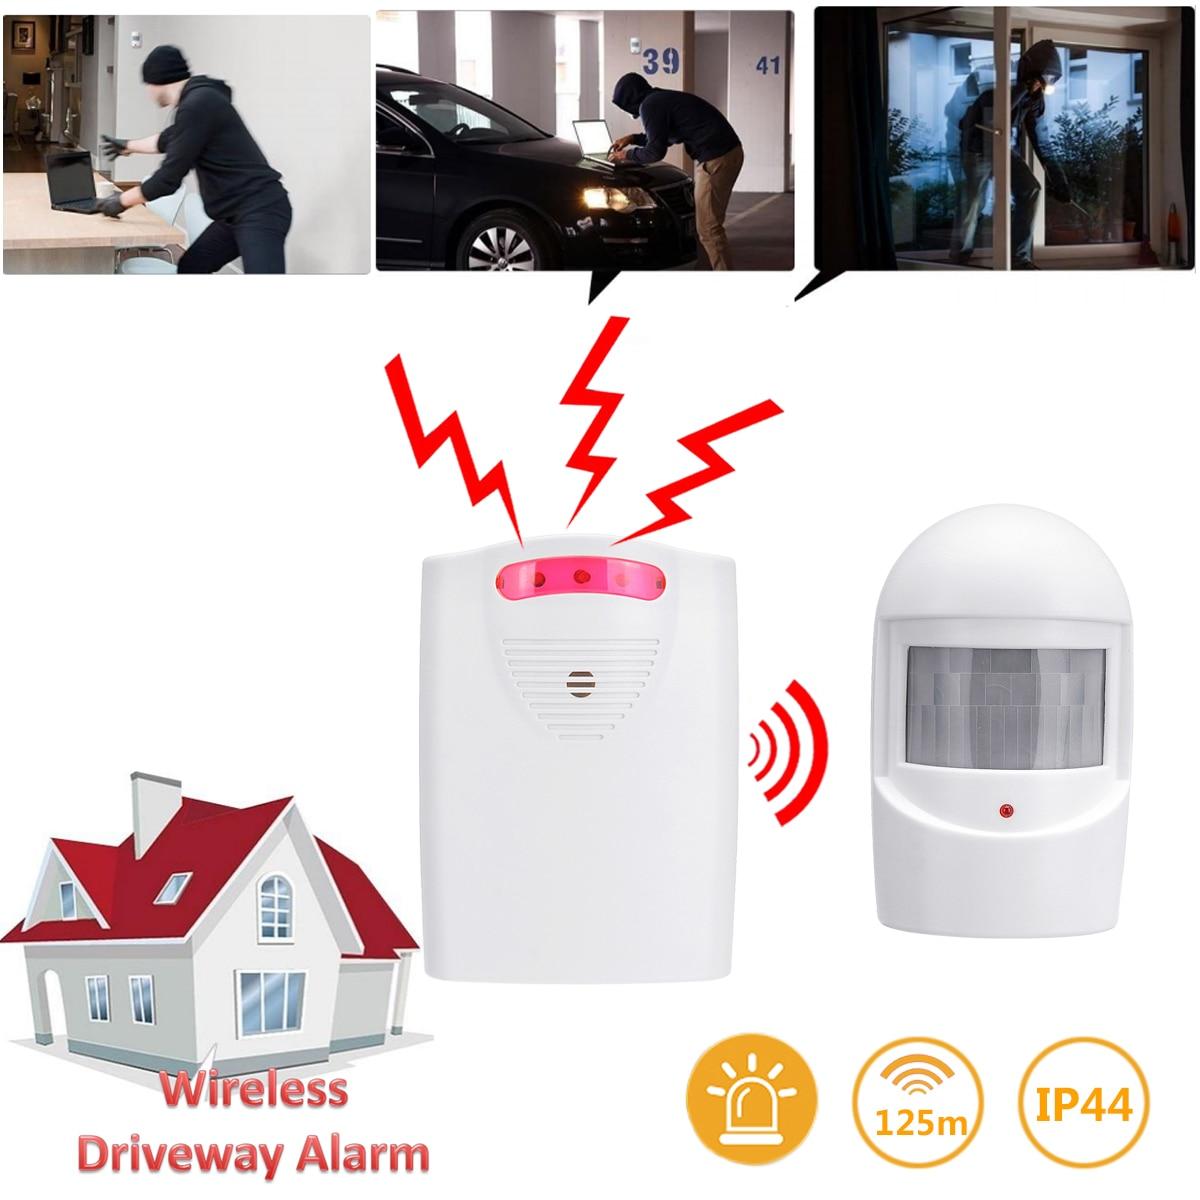 NEW Wireless Driveway Alarm Alert System Home Security Garage Shed PIR Motion Sensor